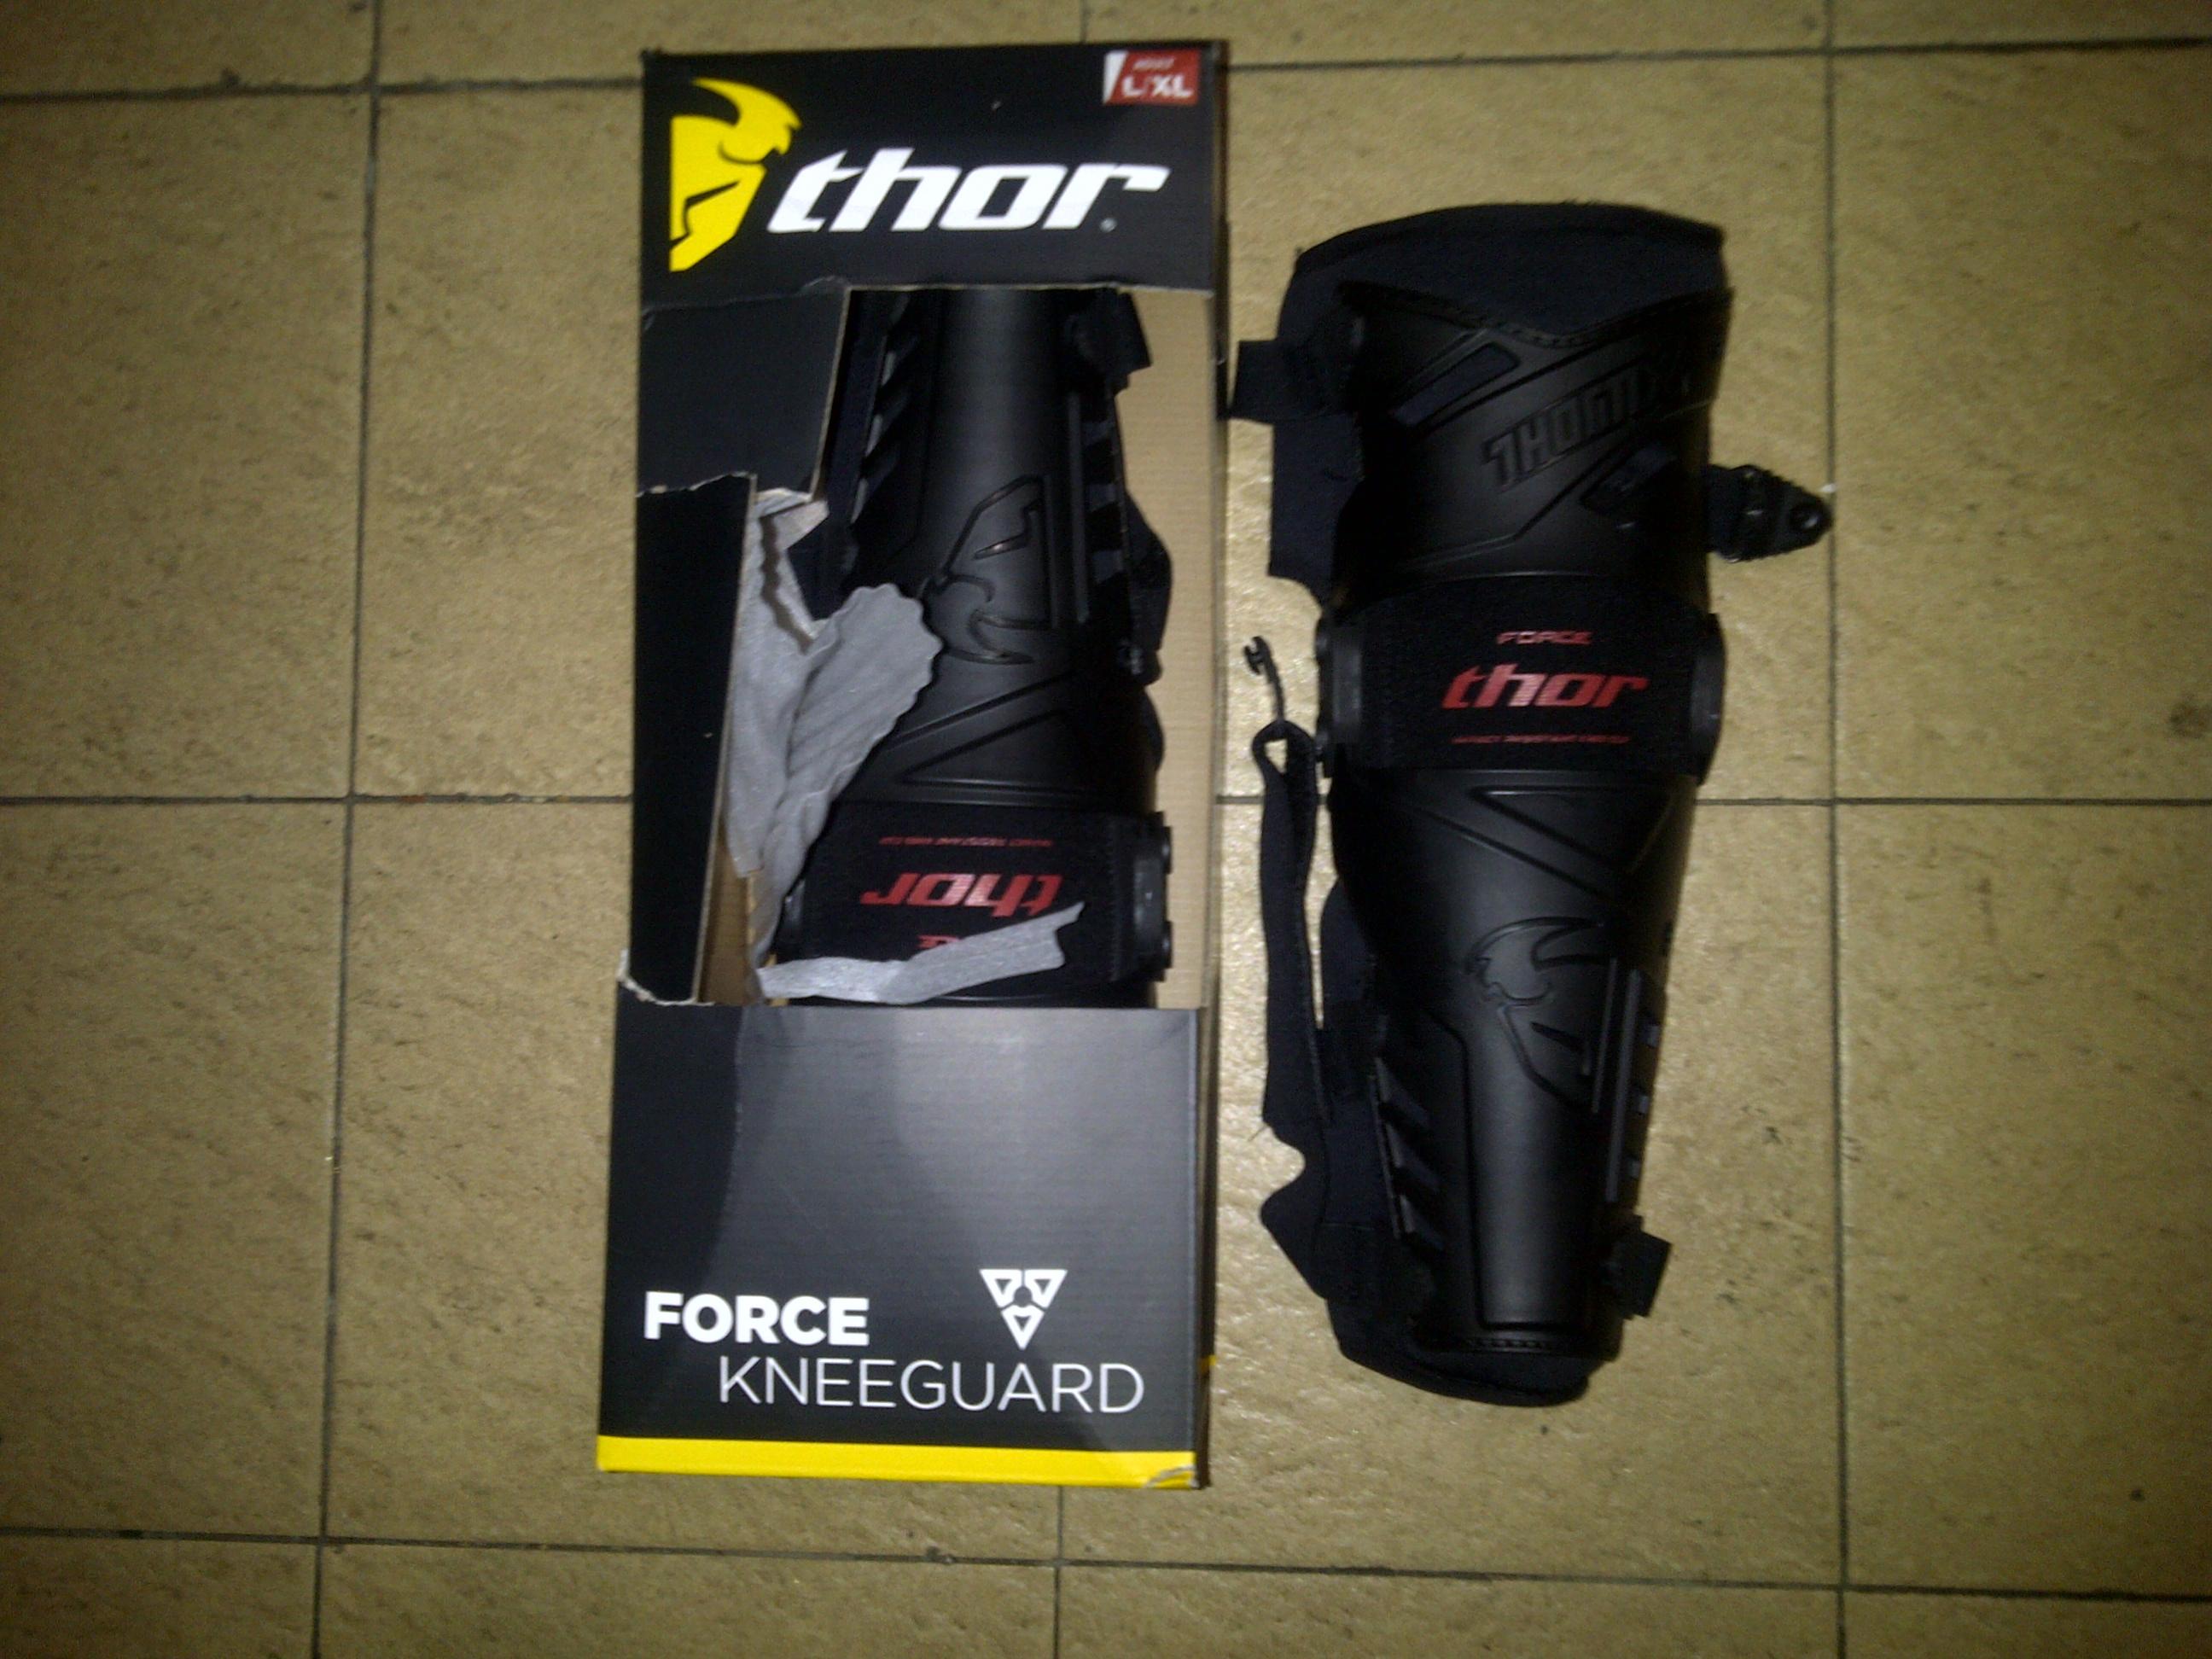 knee guard force Jual knee guard thor force